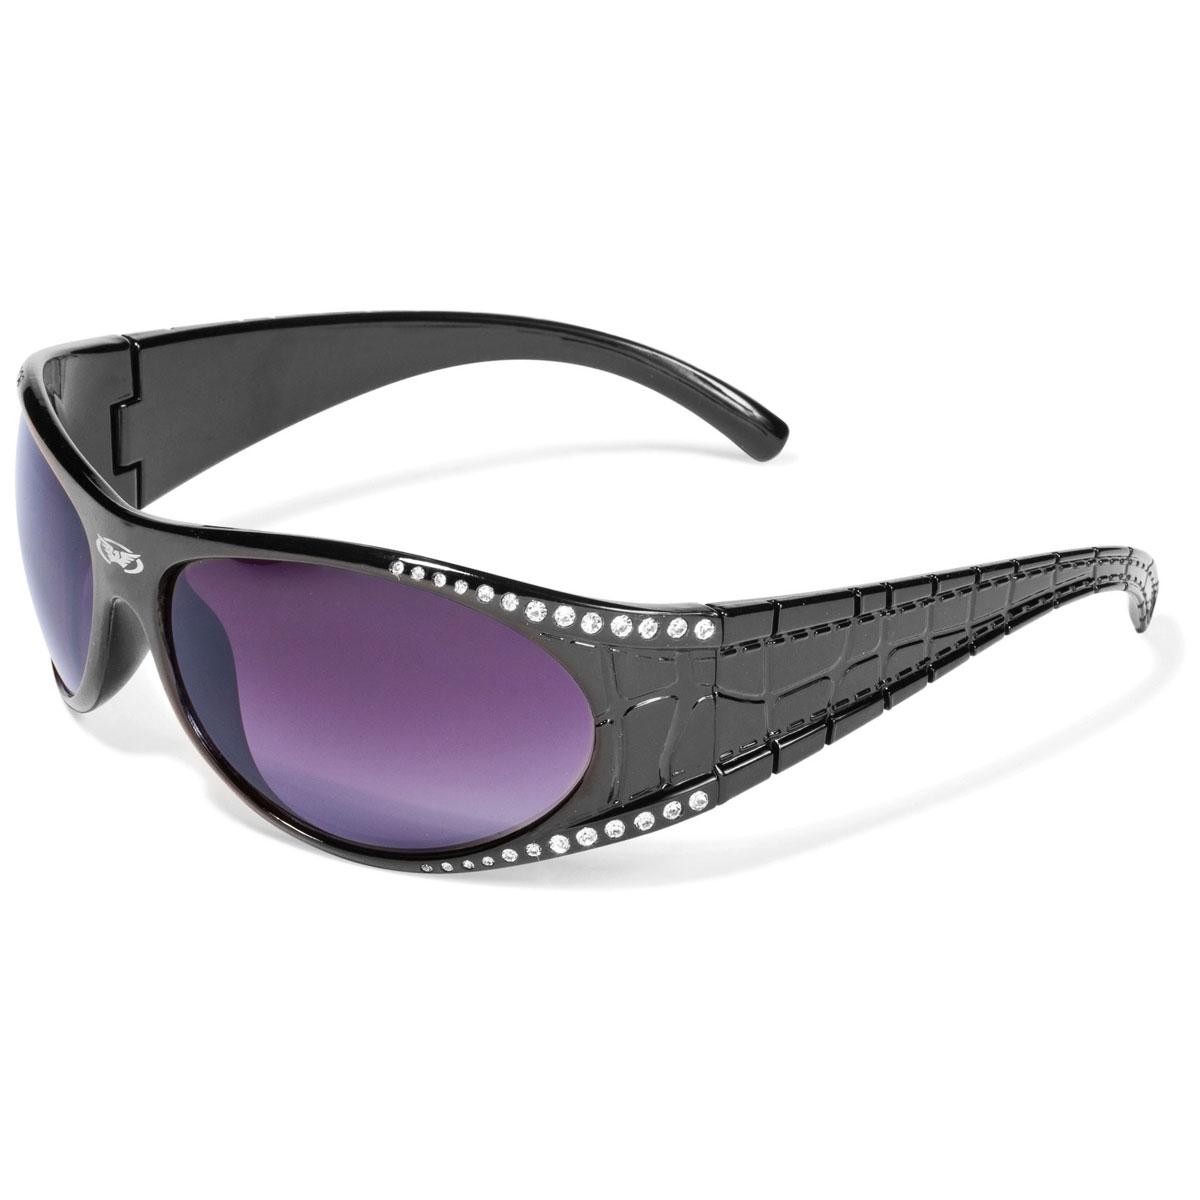 global vision eyewear marilyn 1 5 black frame sunglasses